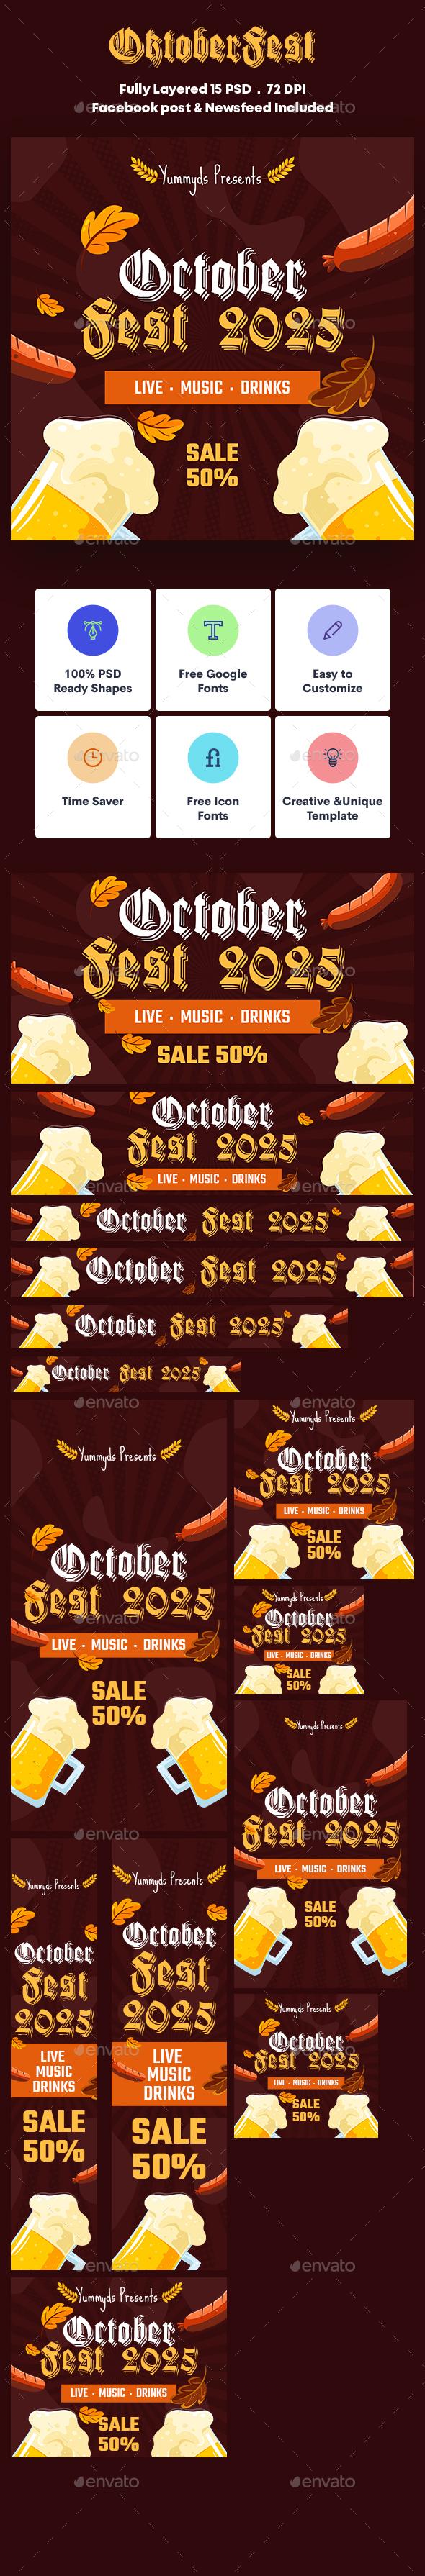 Oktoberfest Banners Ad